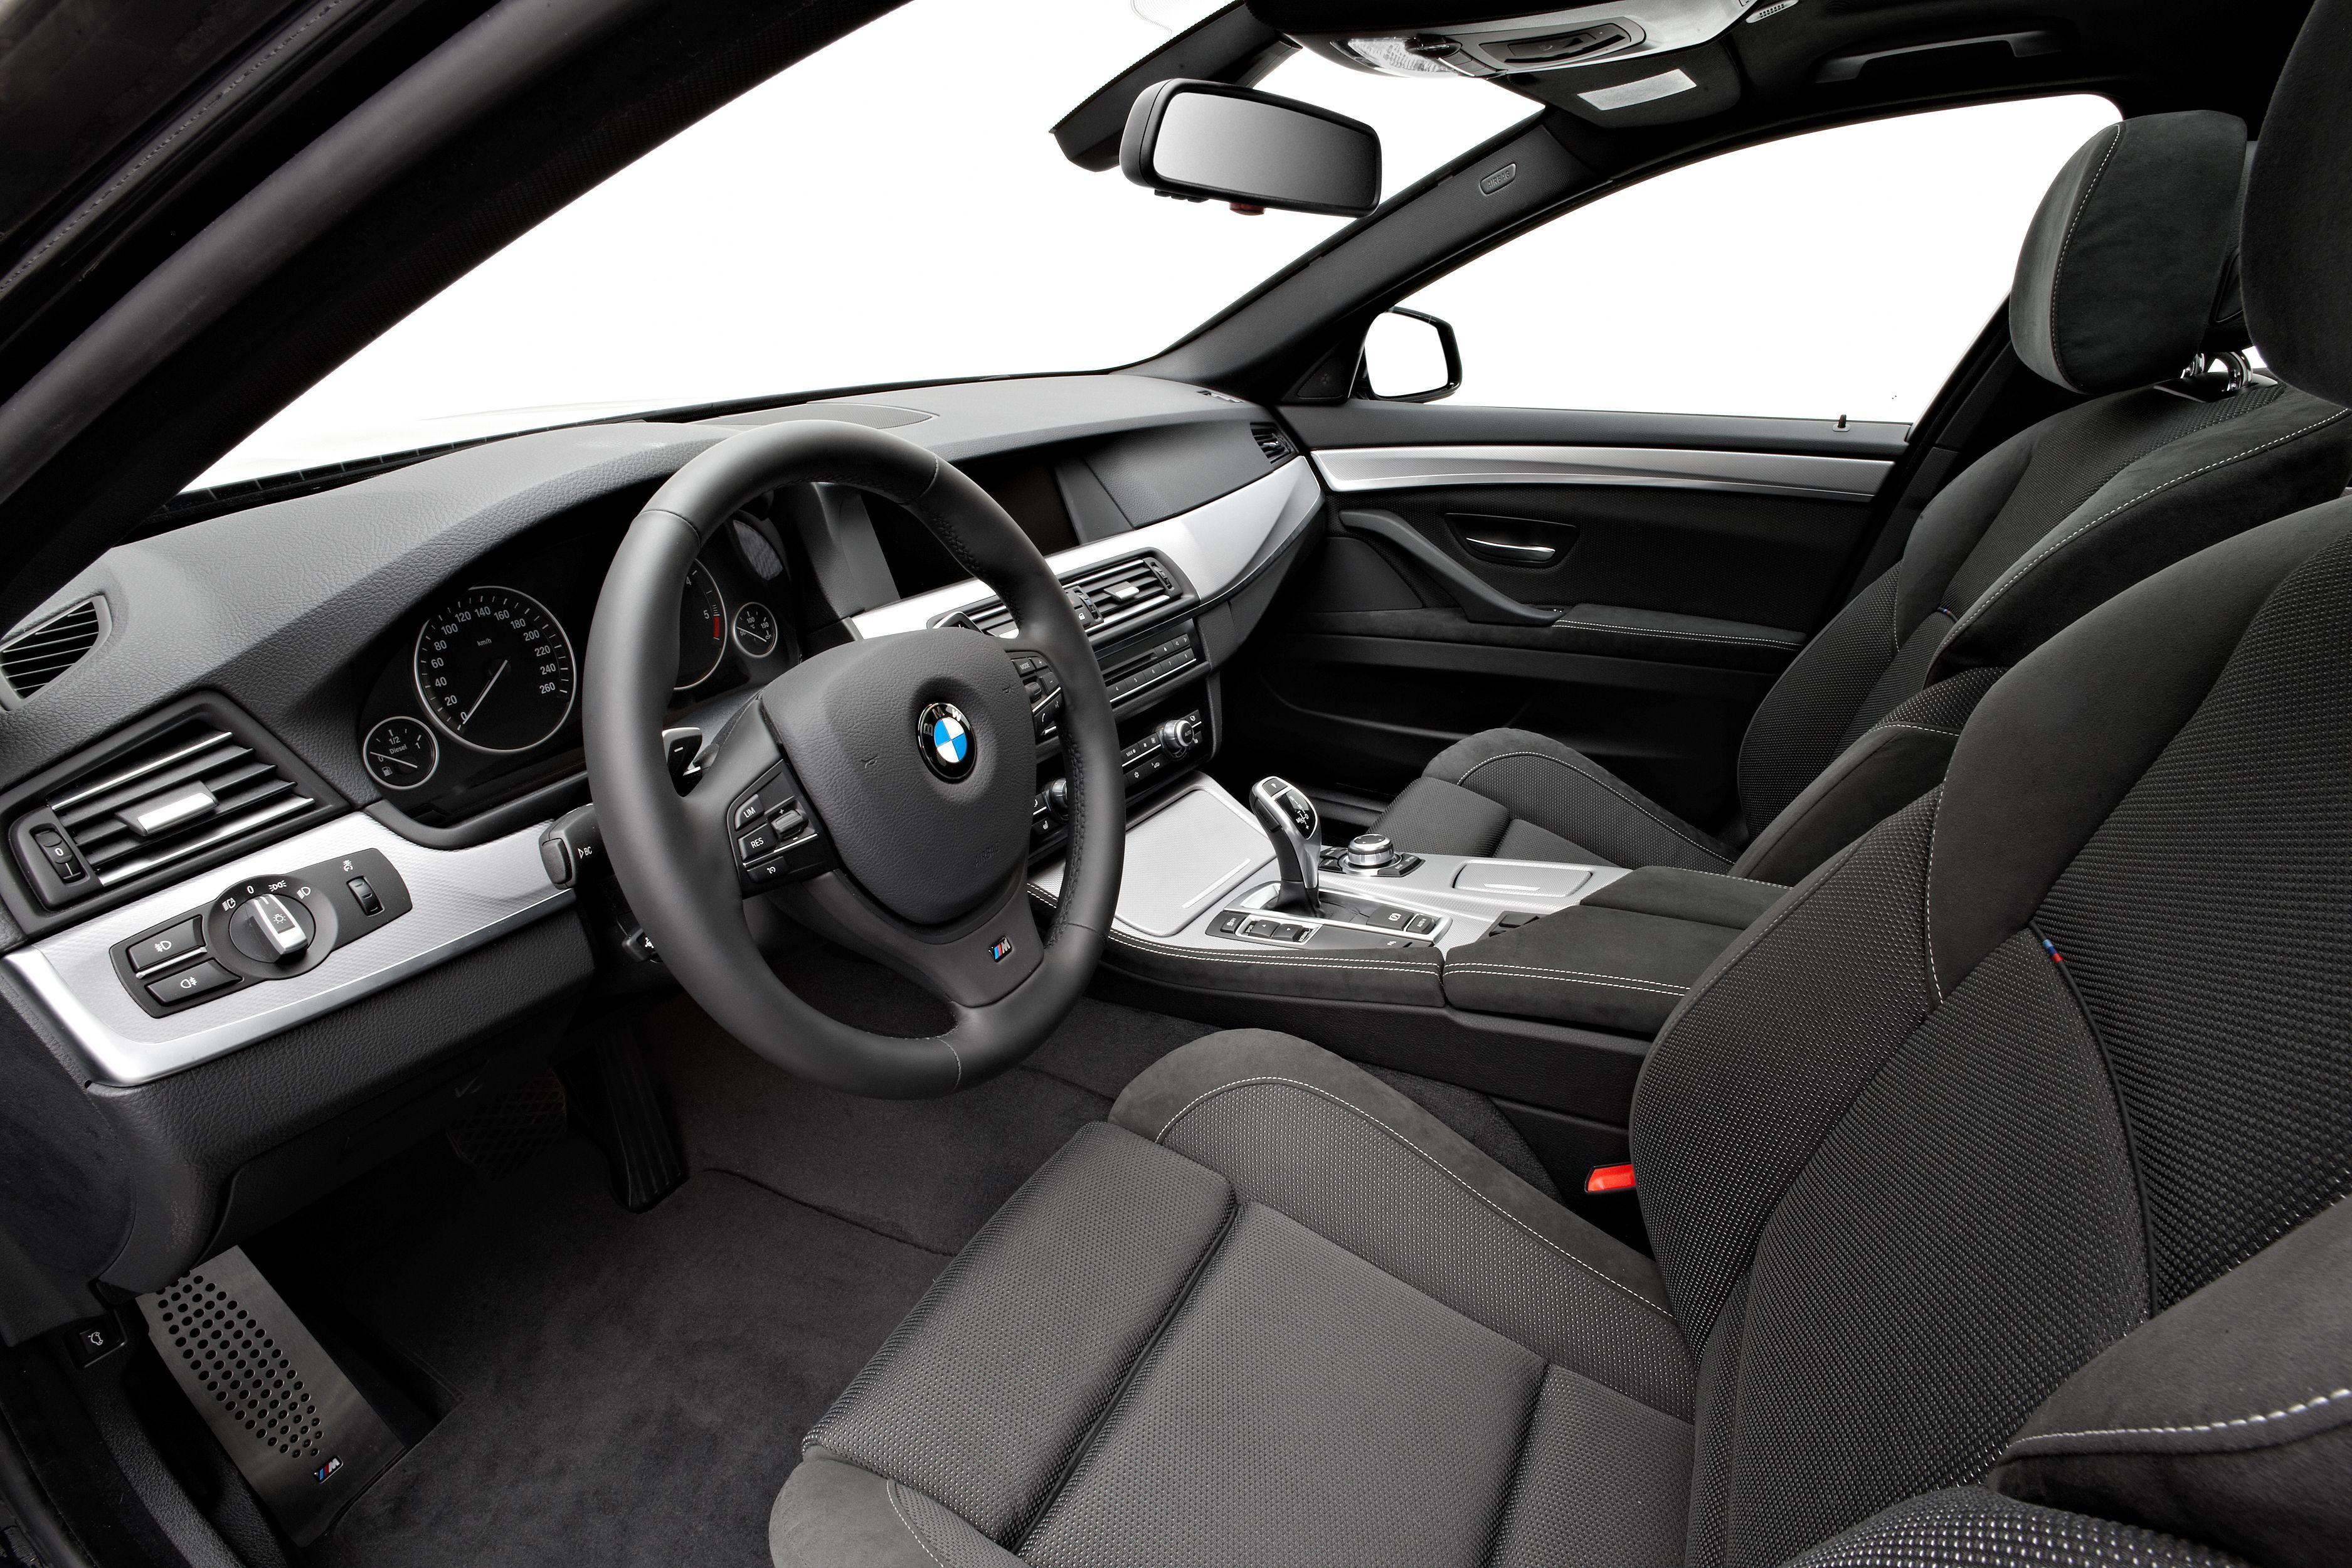 BMW #F10 #535d #Sedan #MPerformance #xDrive